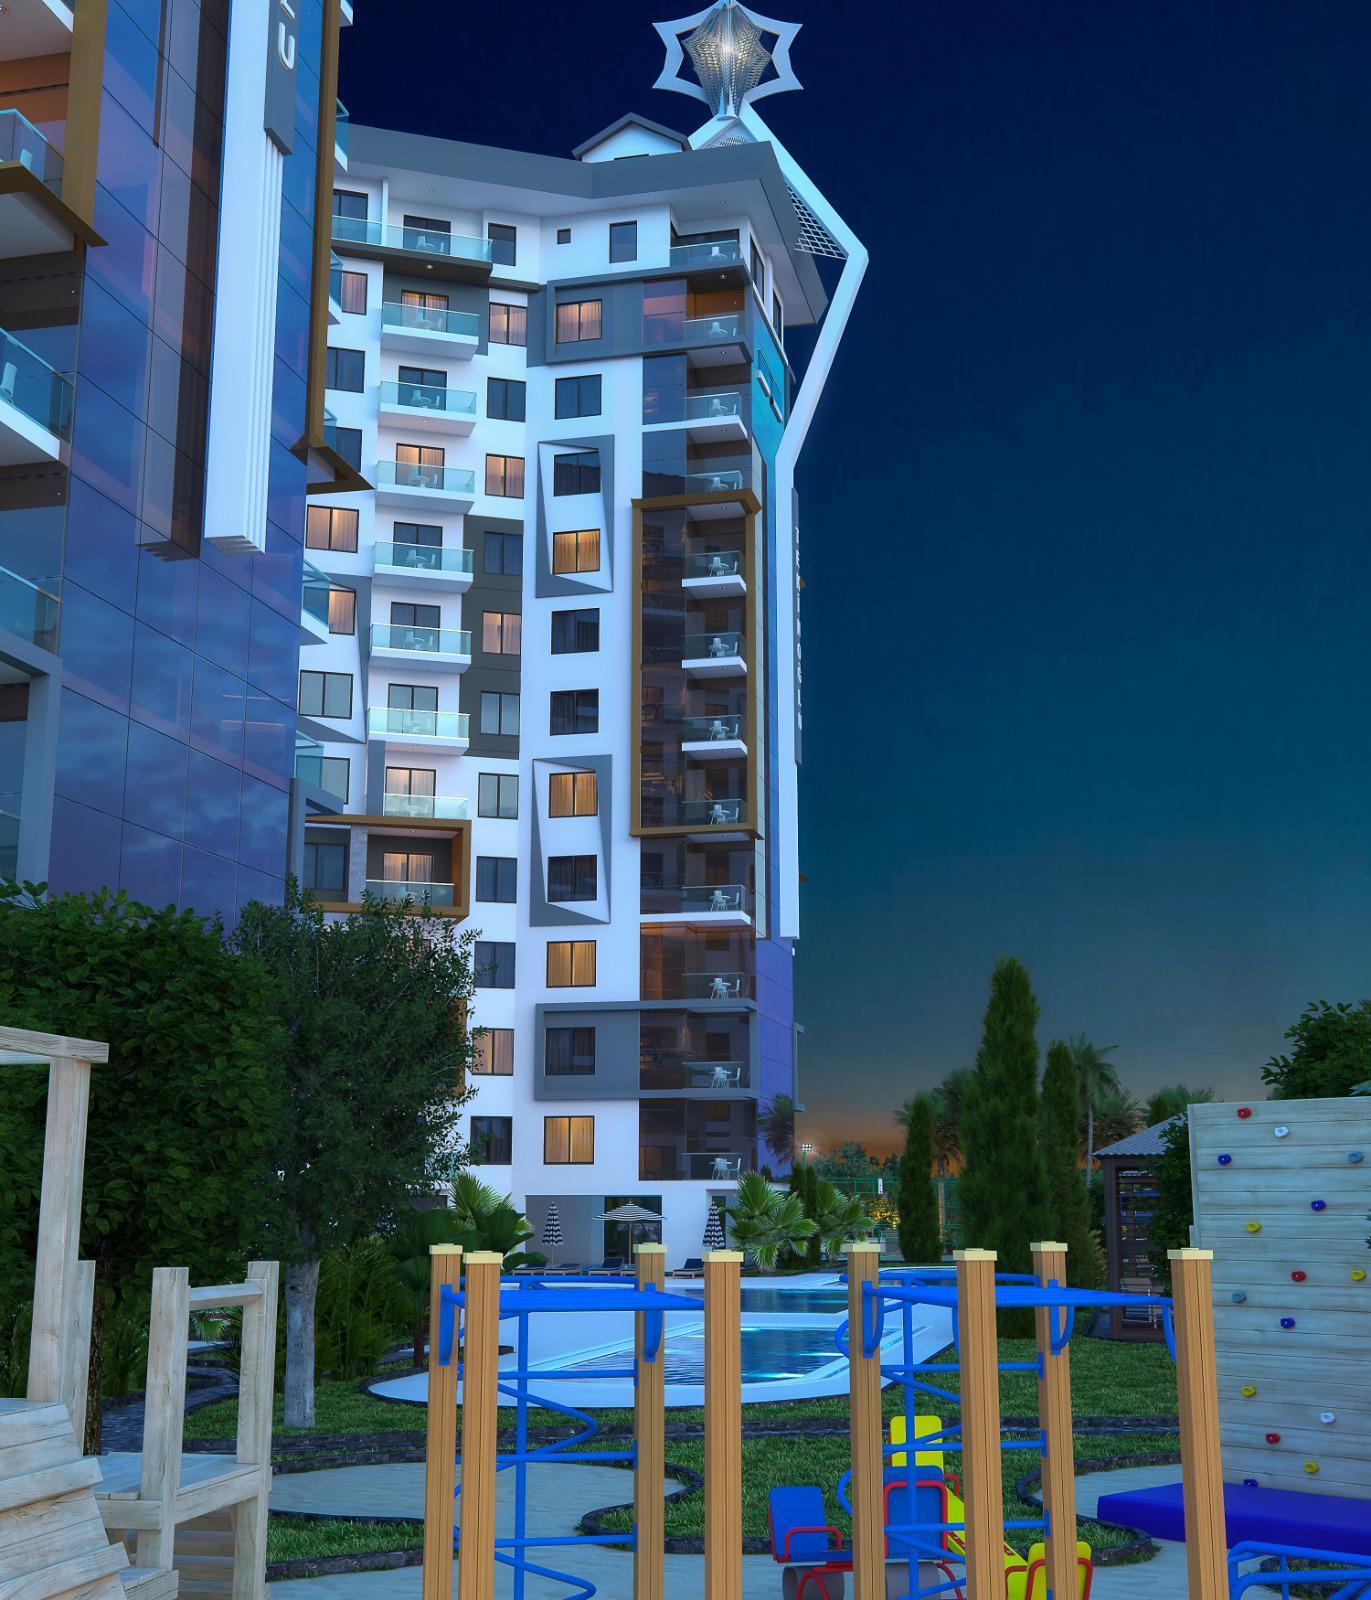 Квартиры и пентхаусы в комплексе с богатой инфраструктурой район Махмутлар - Фото 15